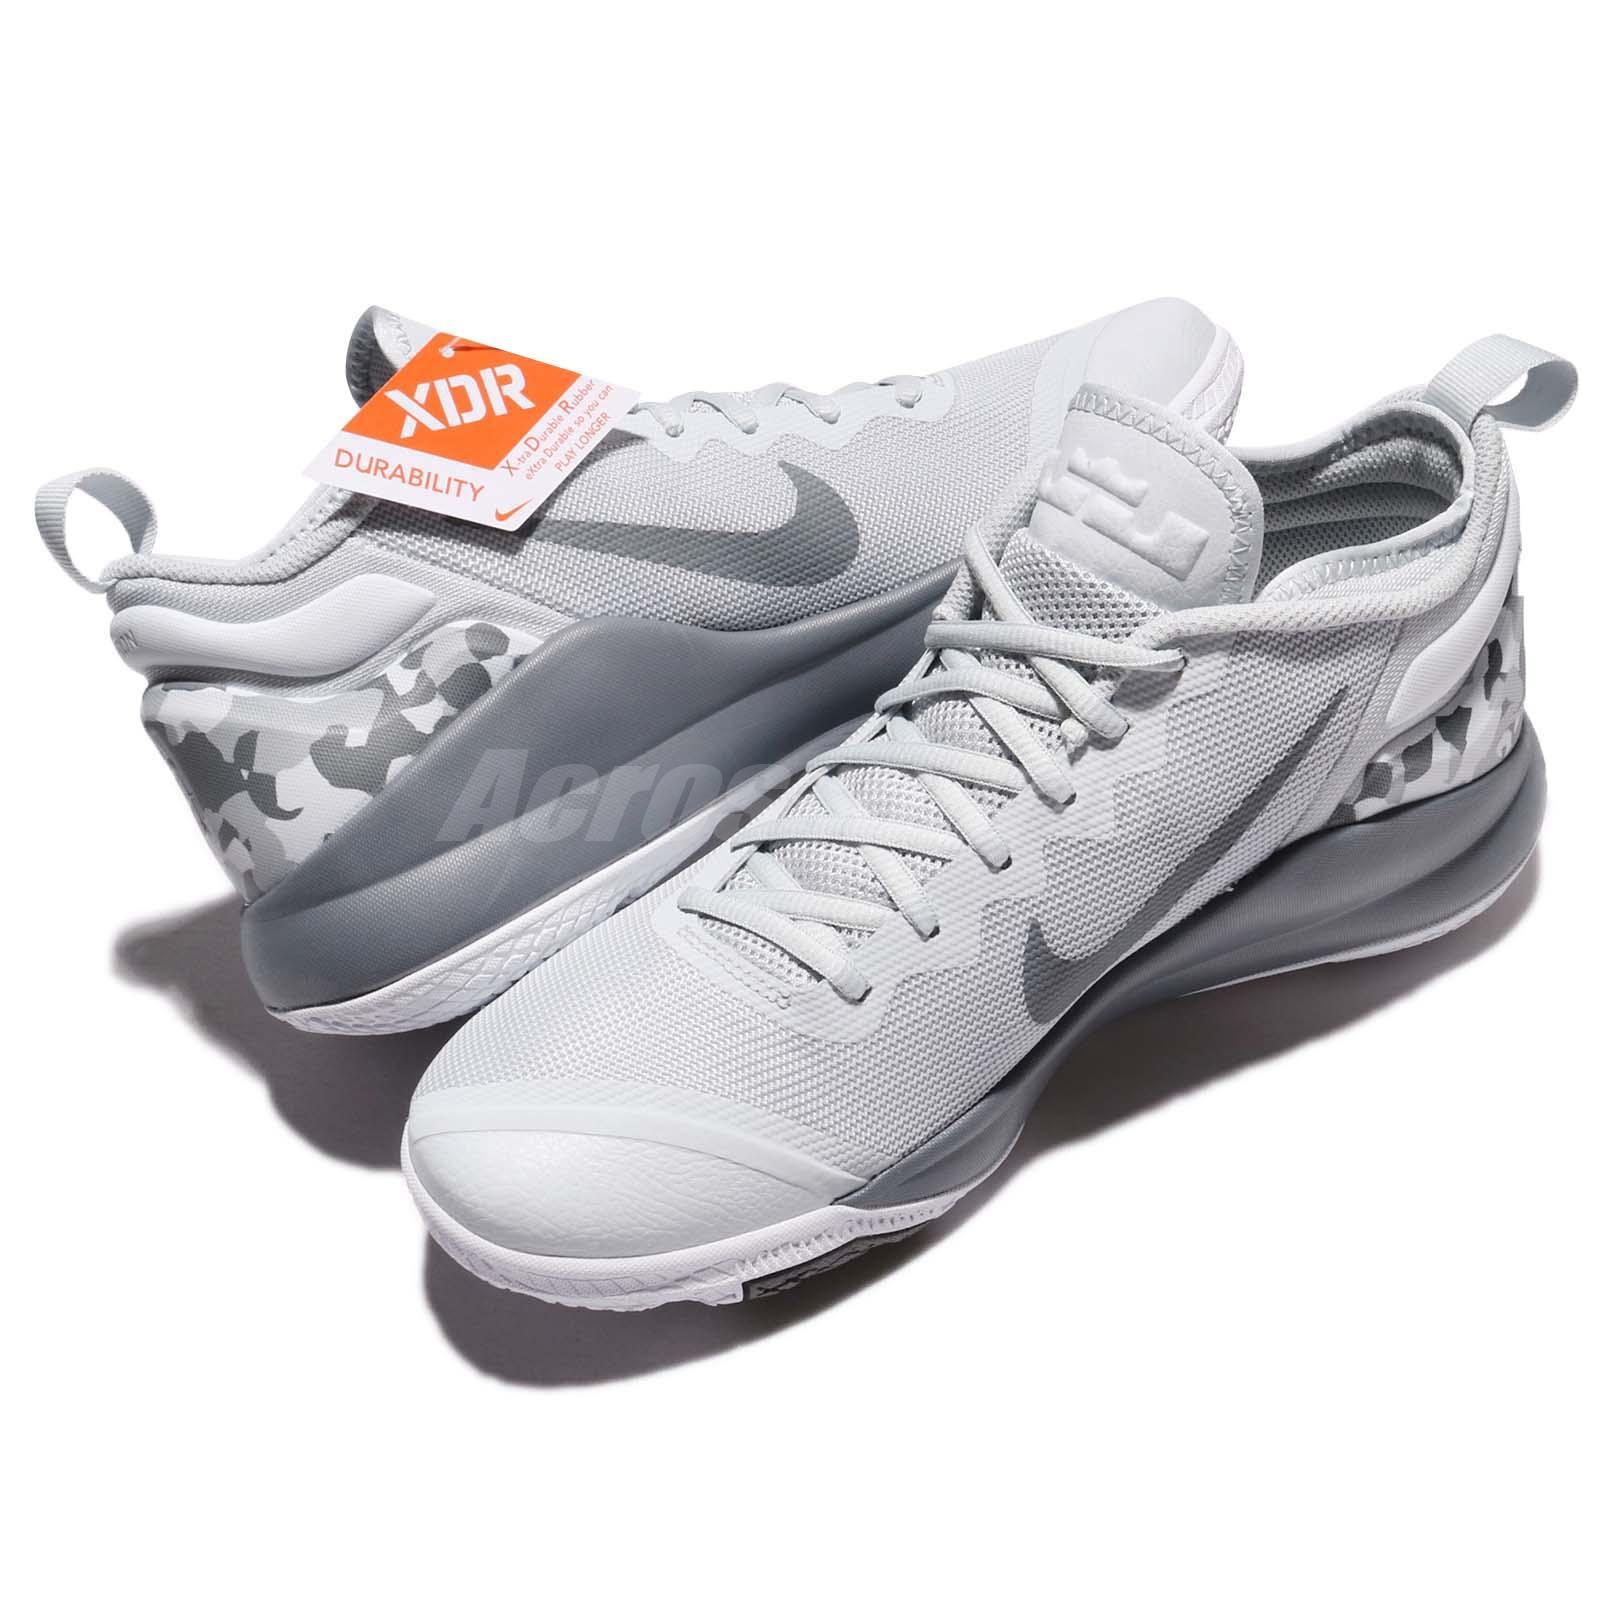 044ea2a8fd3 ... where can i buy nike lebron witness ii ep 2 james grey white camo men  basketball